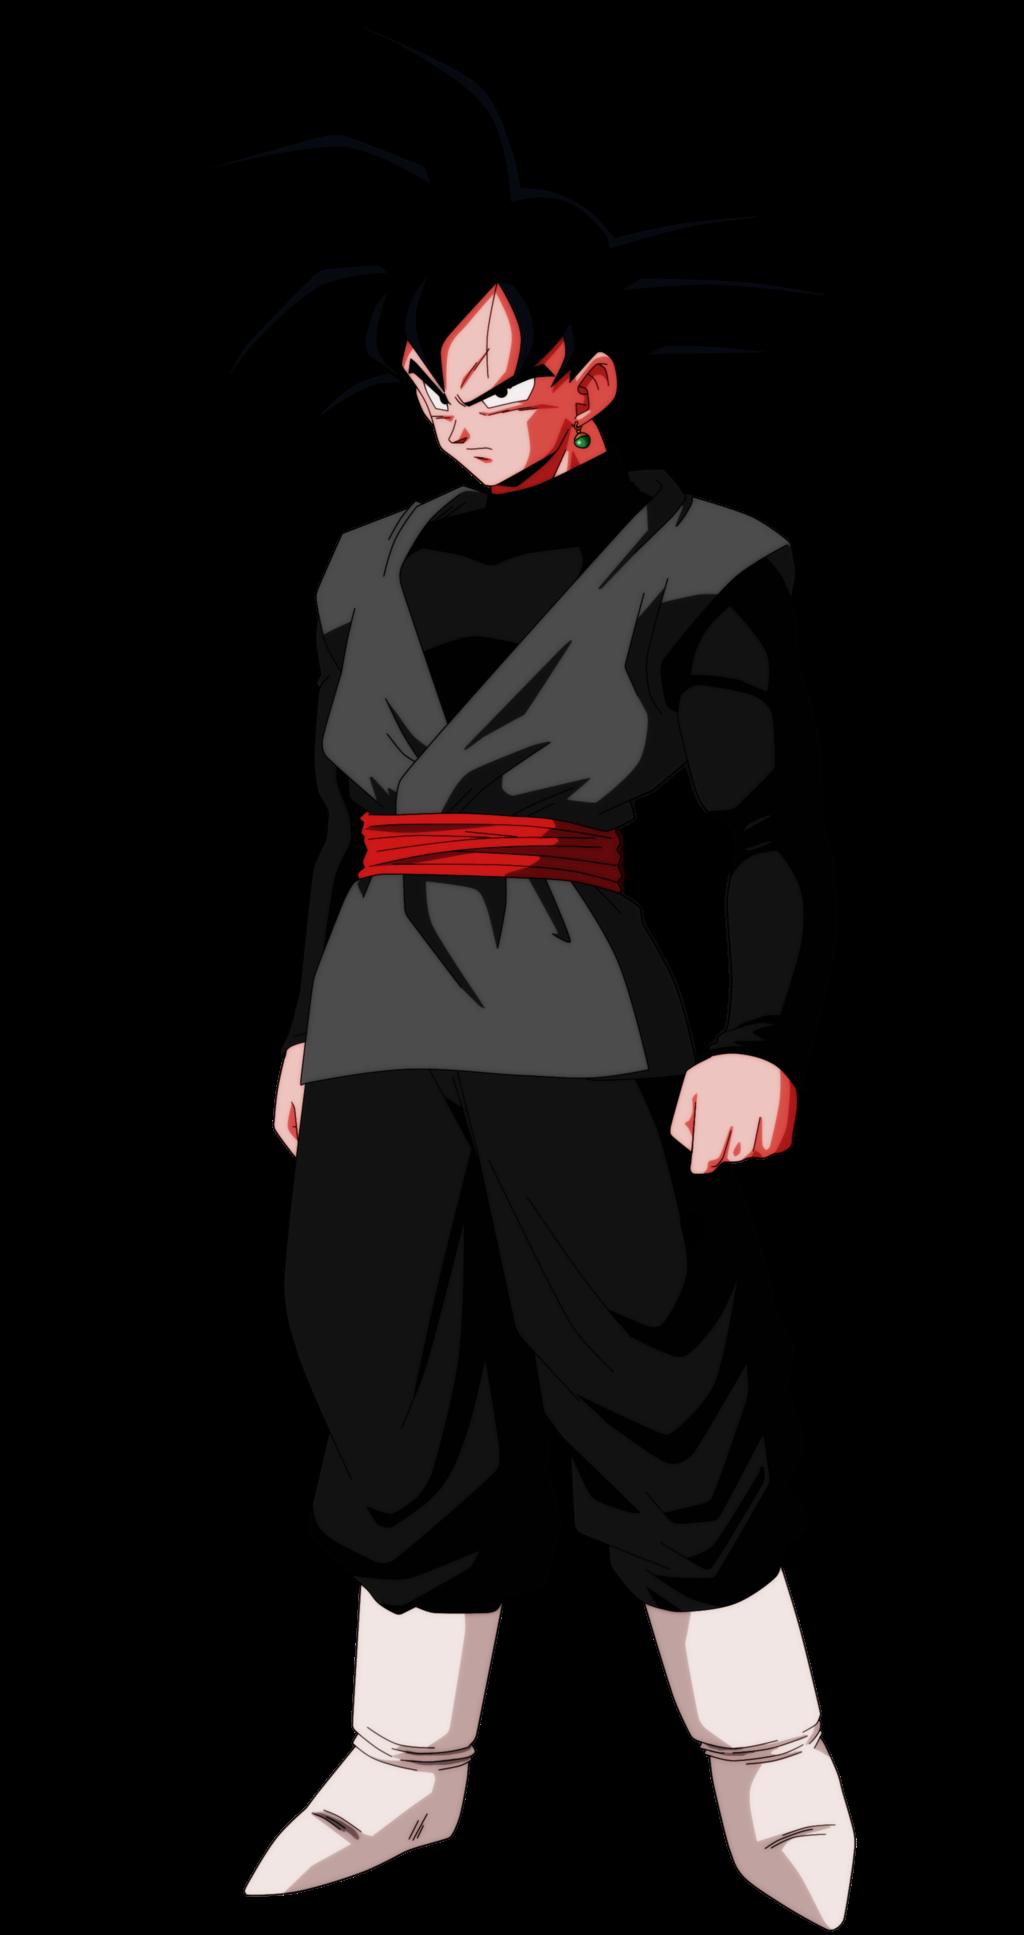 Dragon Ball Png Images Transparent Free Download Pngmart Com Dragon Ball Super Manga Dragon Ball Goku Black